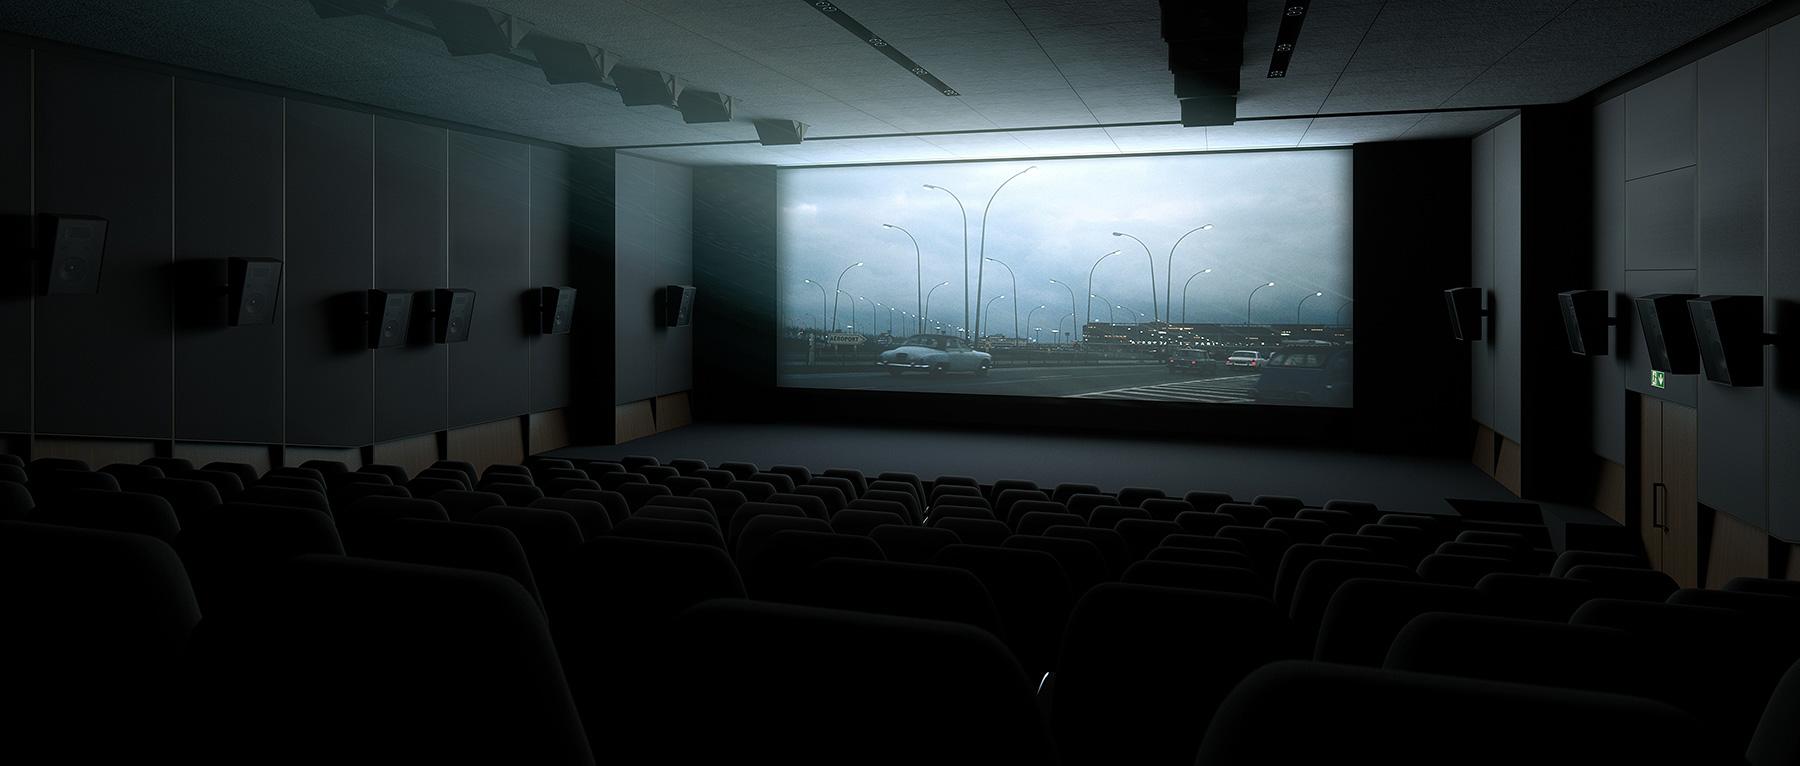 CarmineCrimson-Archviz-2016-cnc-cinema-vue-haut.jpg